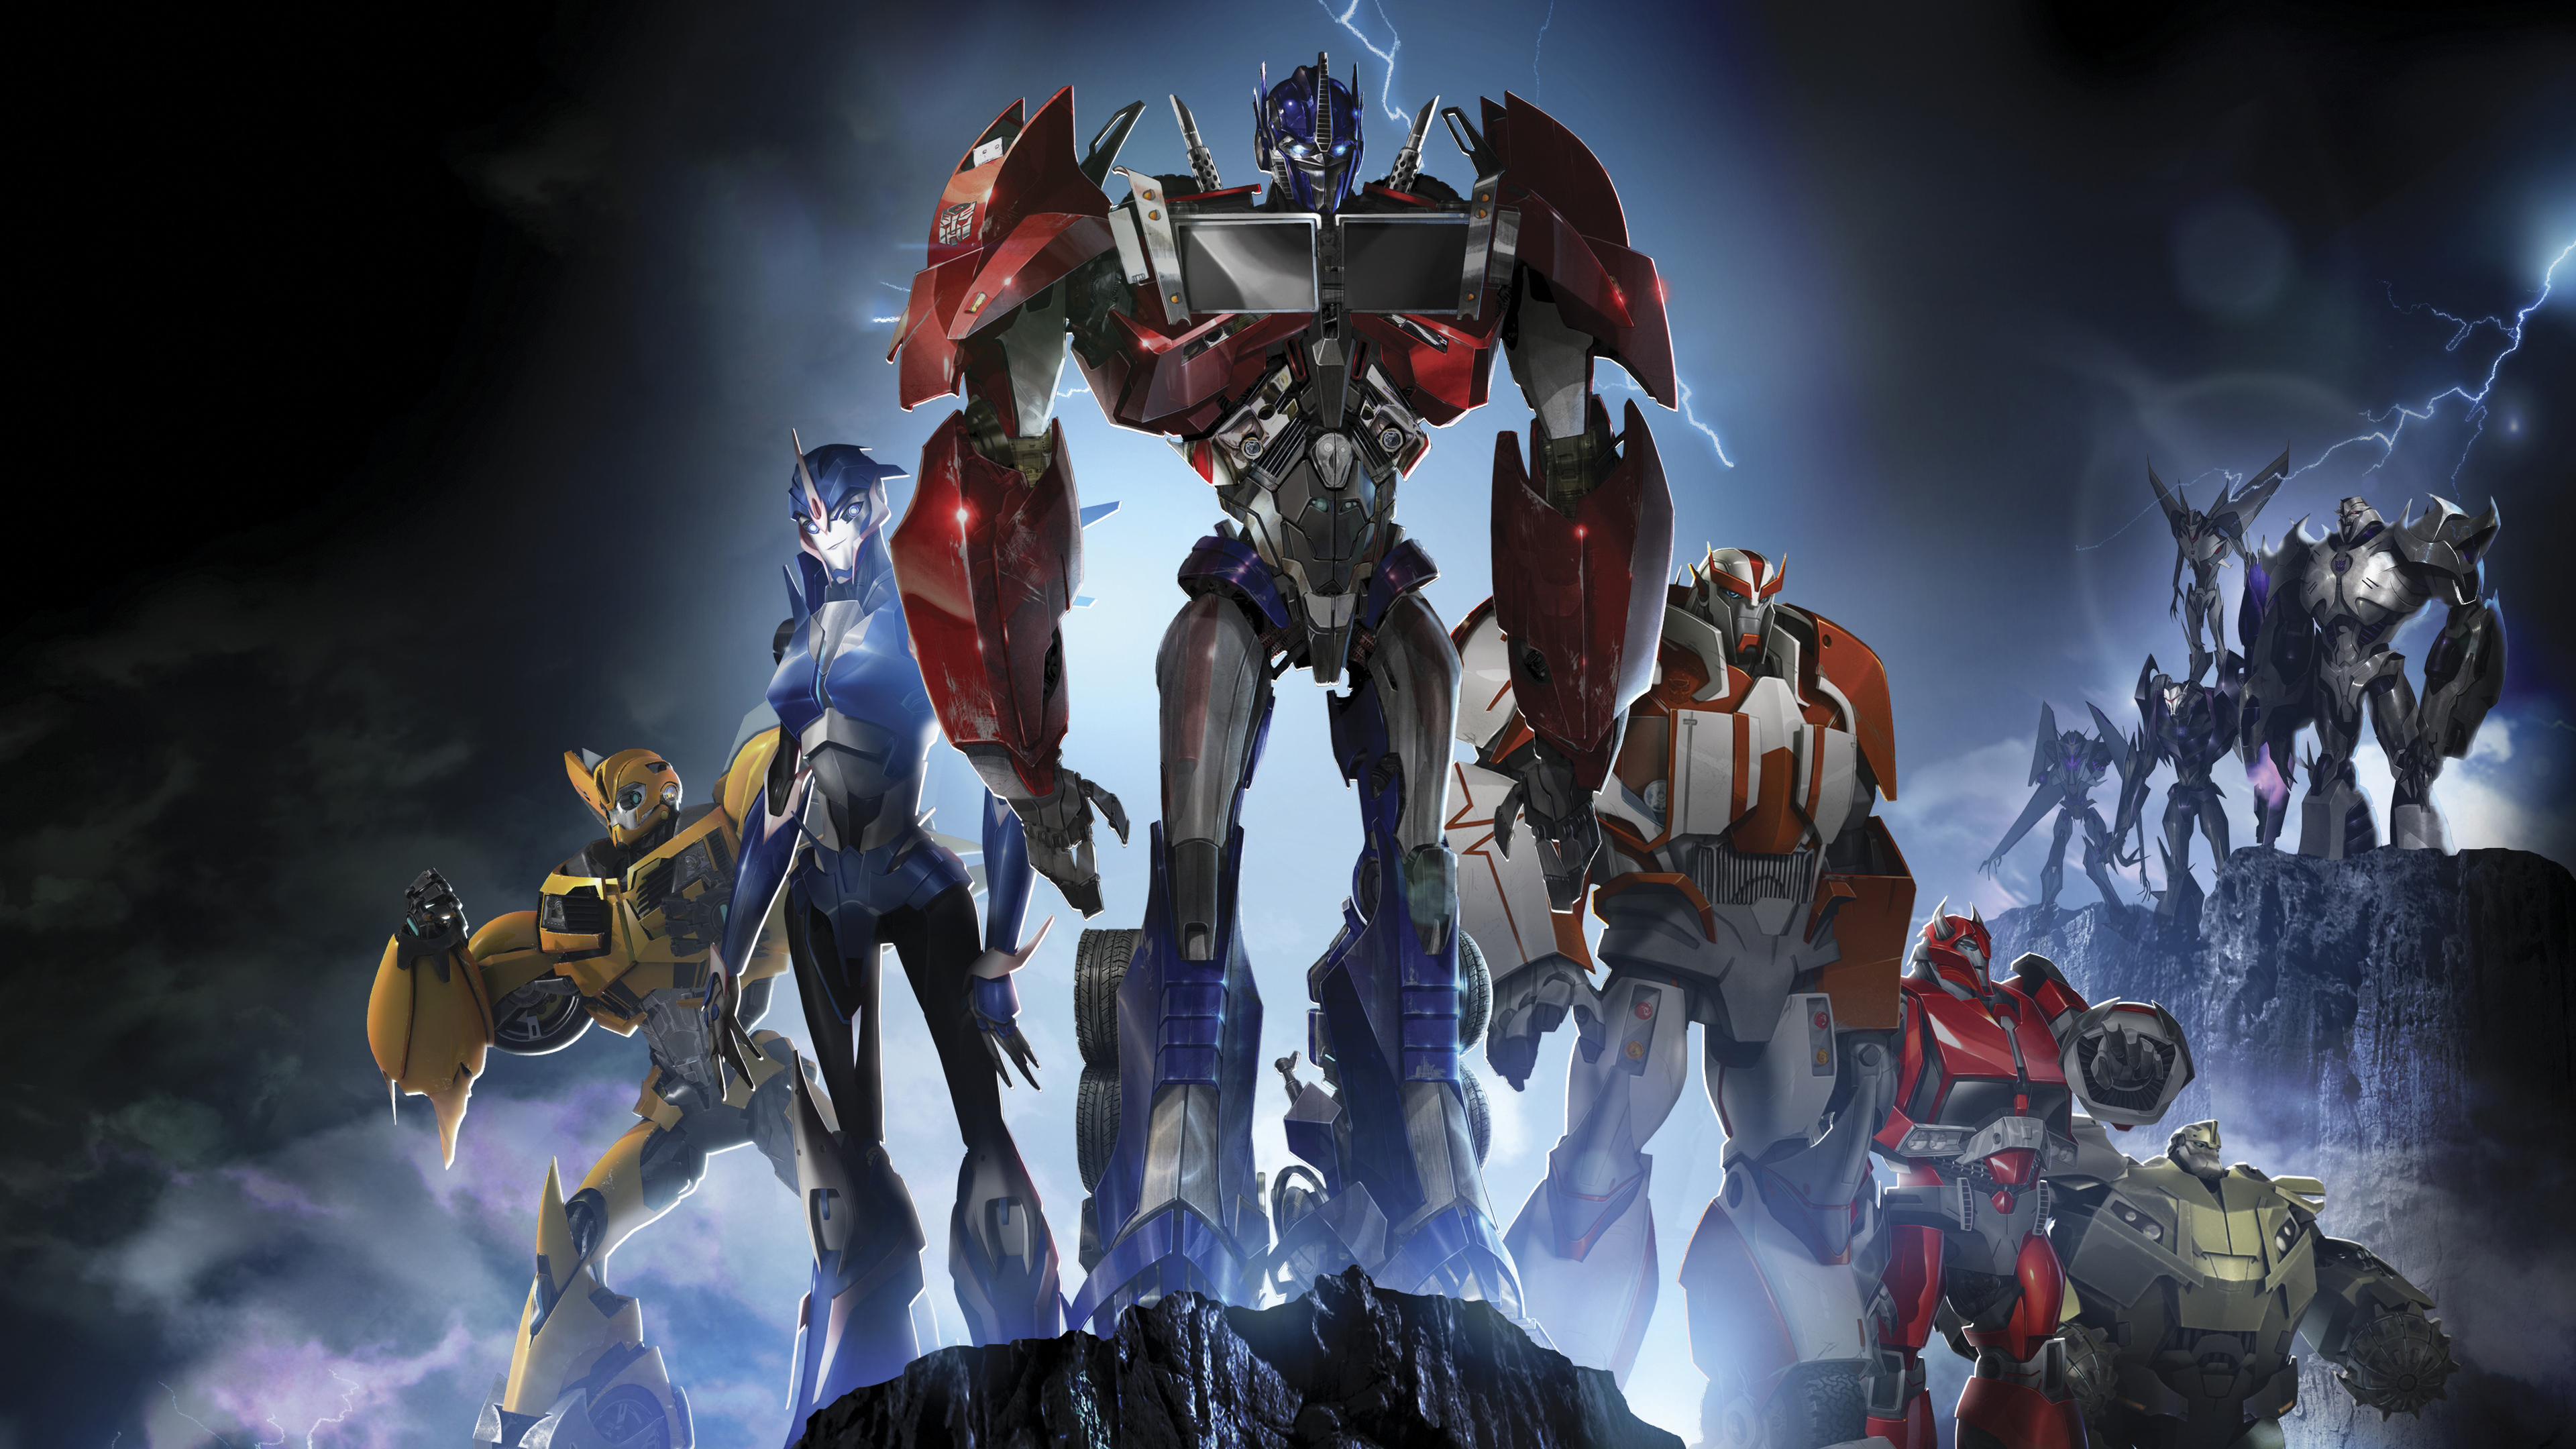 transformers prime 4k 1546276362 - Transformers Prime 4k - transformers wallpapers, hd-wallpapers, 4k-wallpapers